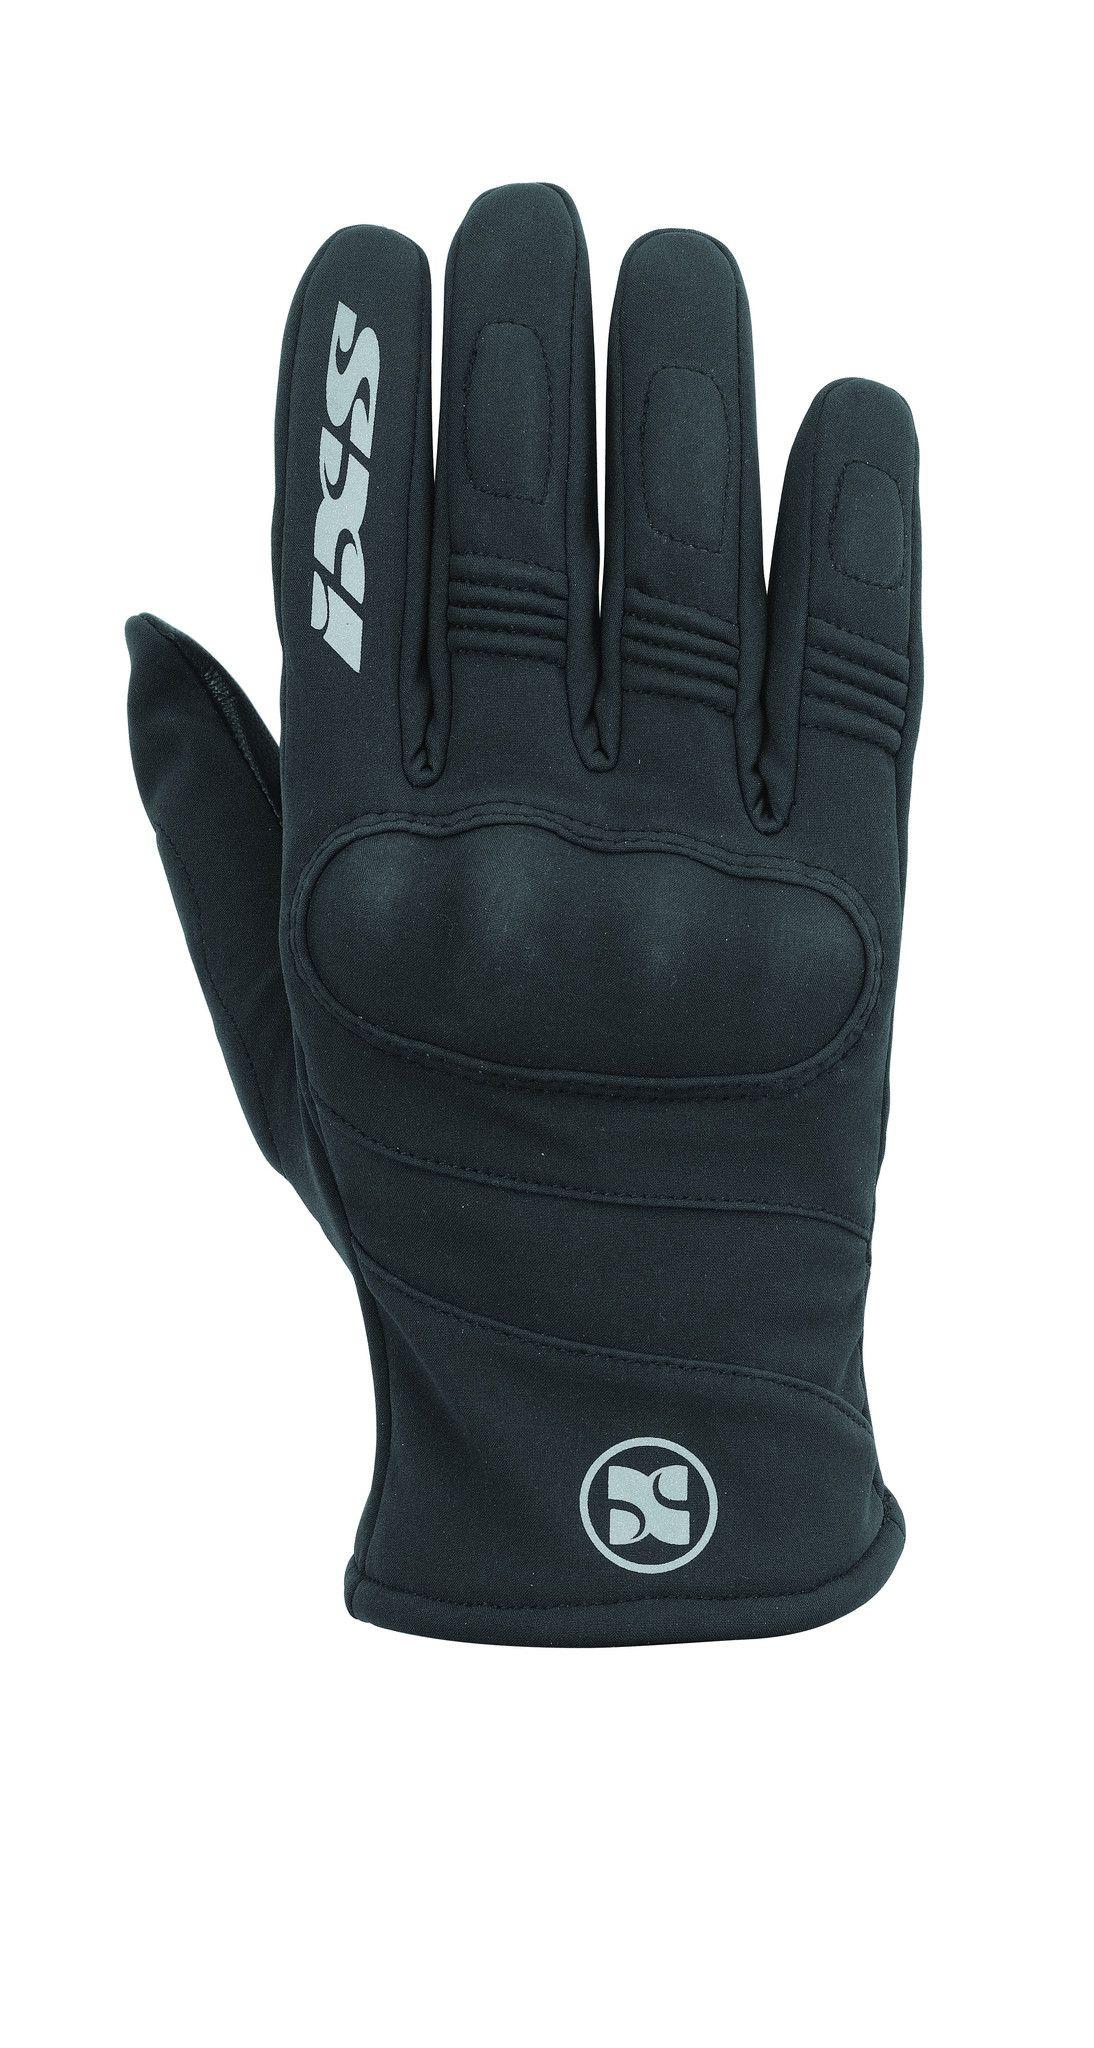 Motorcycle gloves ixs - Gara Motorcycle Glove Ixs Motorcycle Fashion Motorcycles Gear